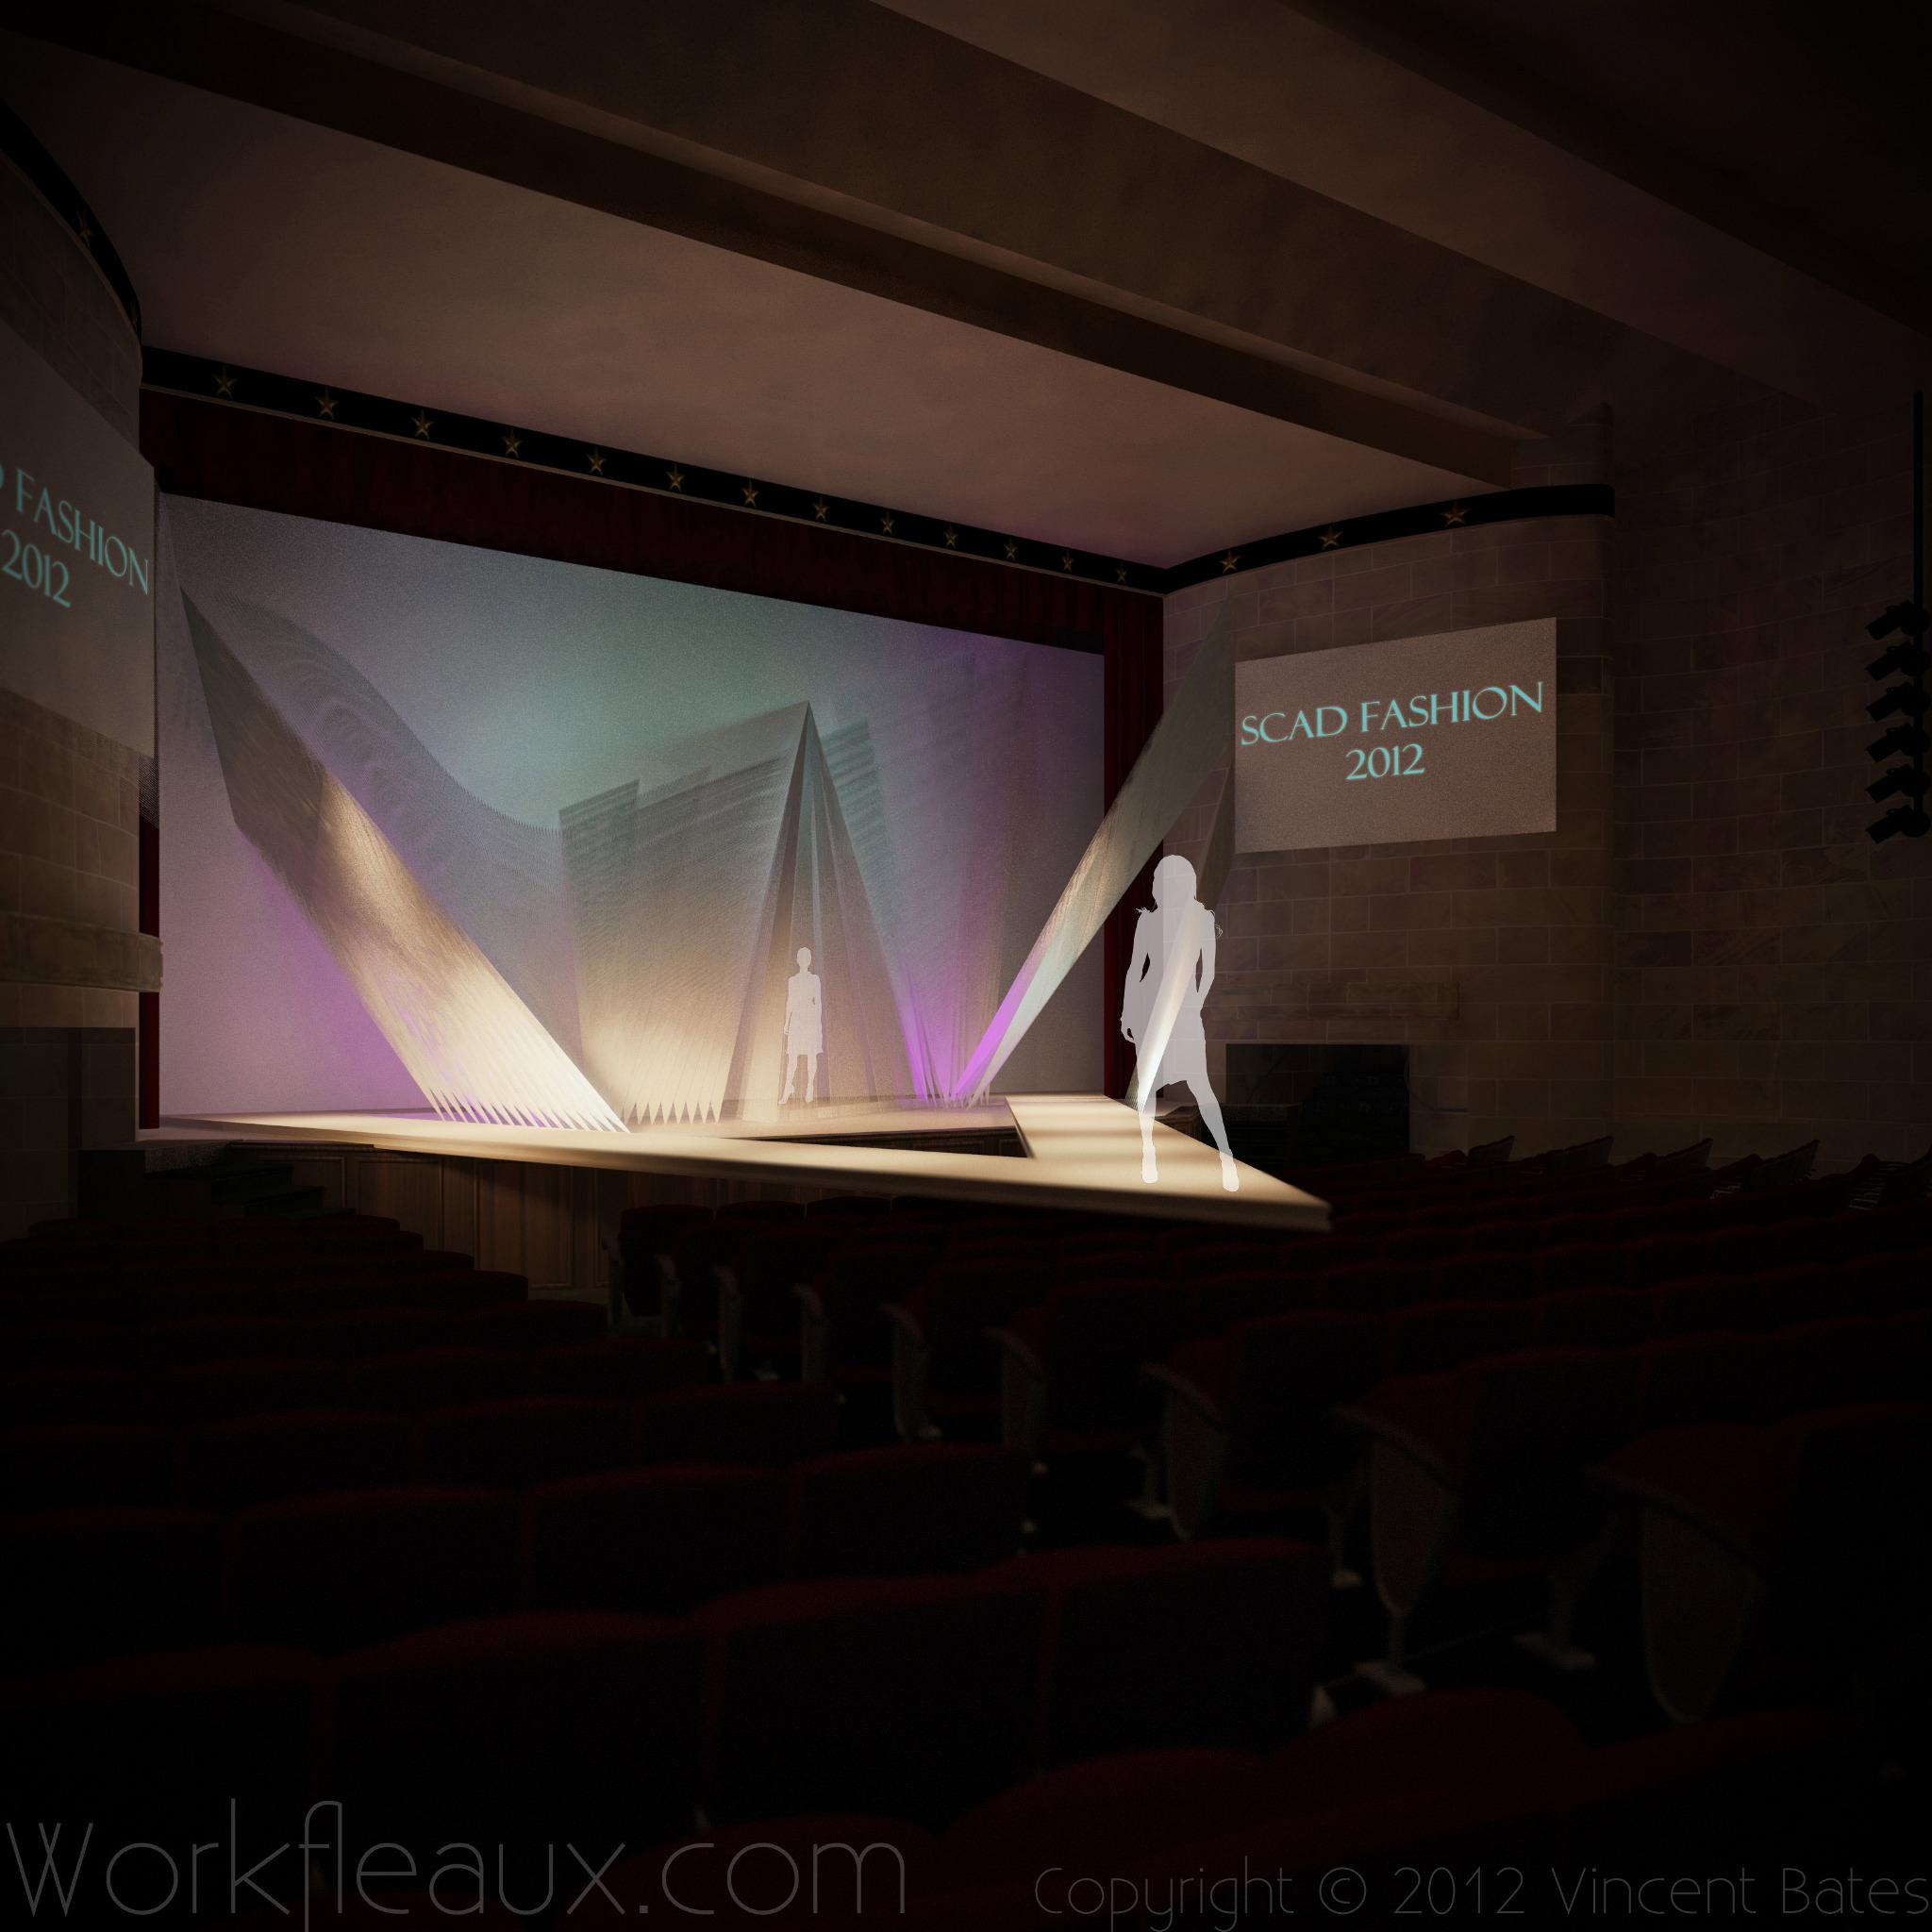 2012 Scad Fashion Show Workfleaux